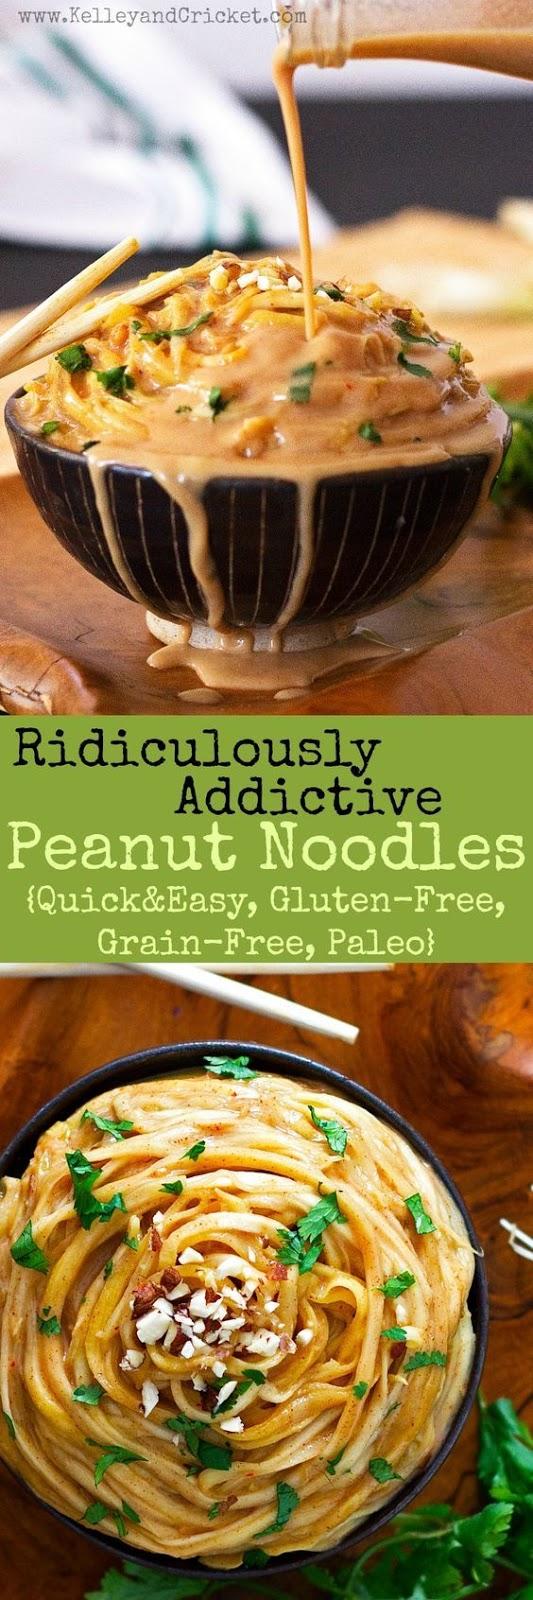 Crazy Good Peanut Noodles {Quick&Easy, Gluten-Free, Grain-Free, Paleo}